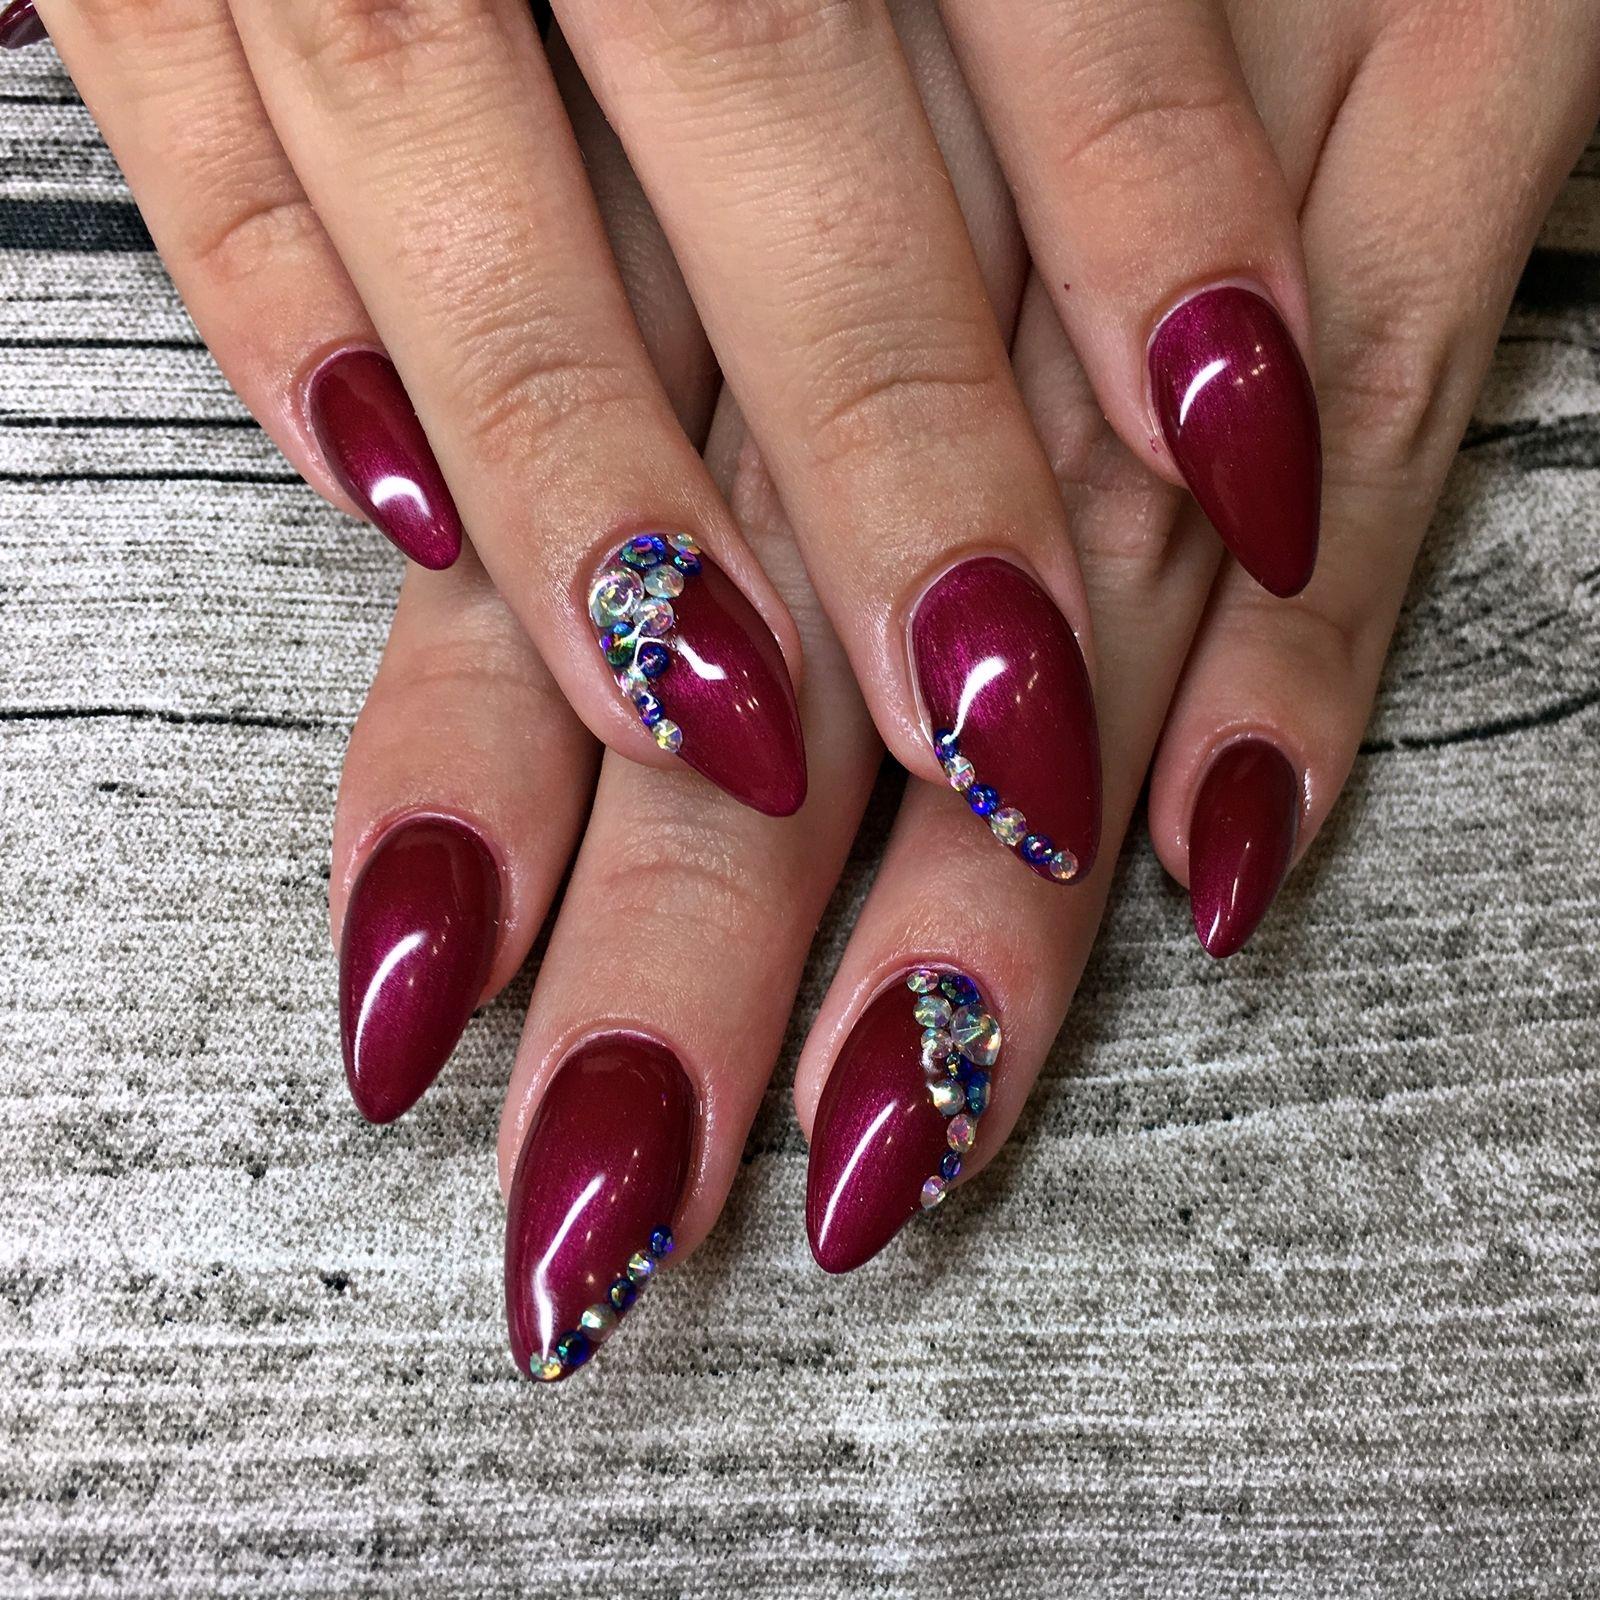 Nail Art Inspiration 1 Fashionladyloves Nagel Mit Diamanten Glitzernagel Nageldesign